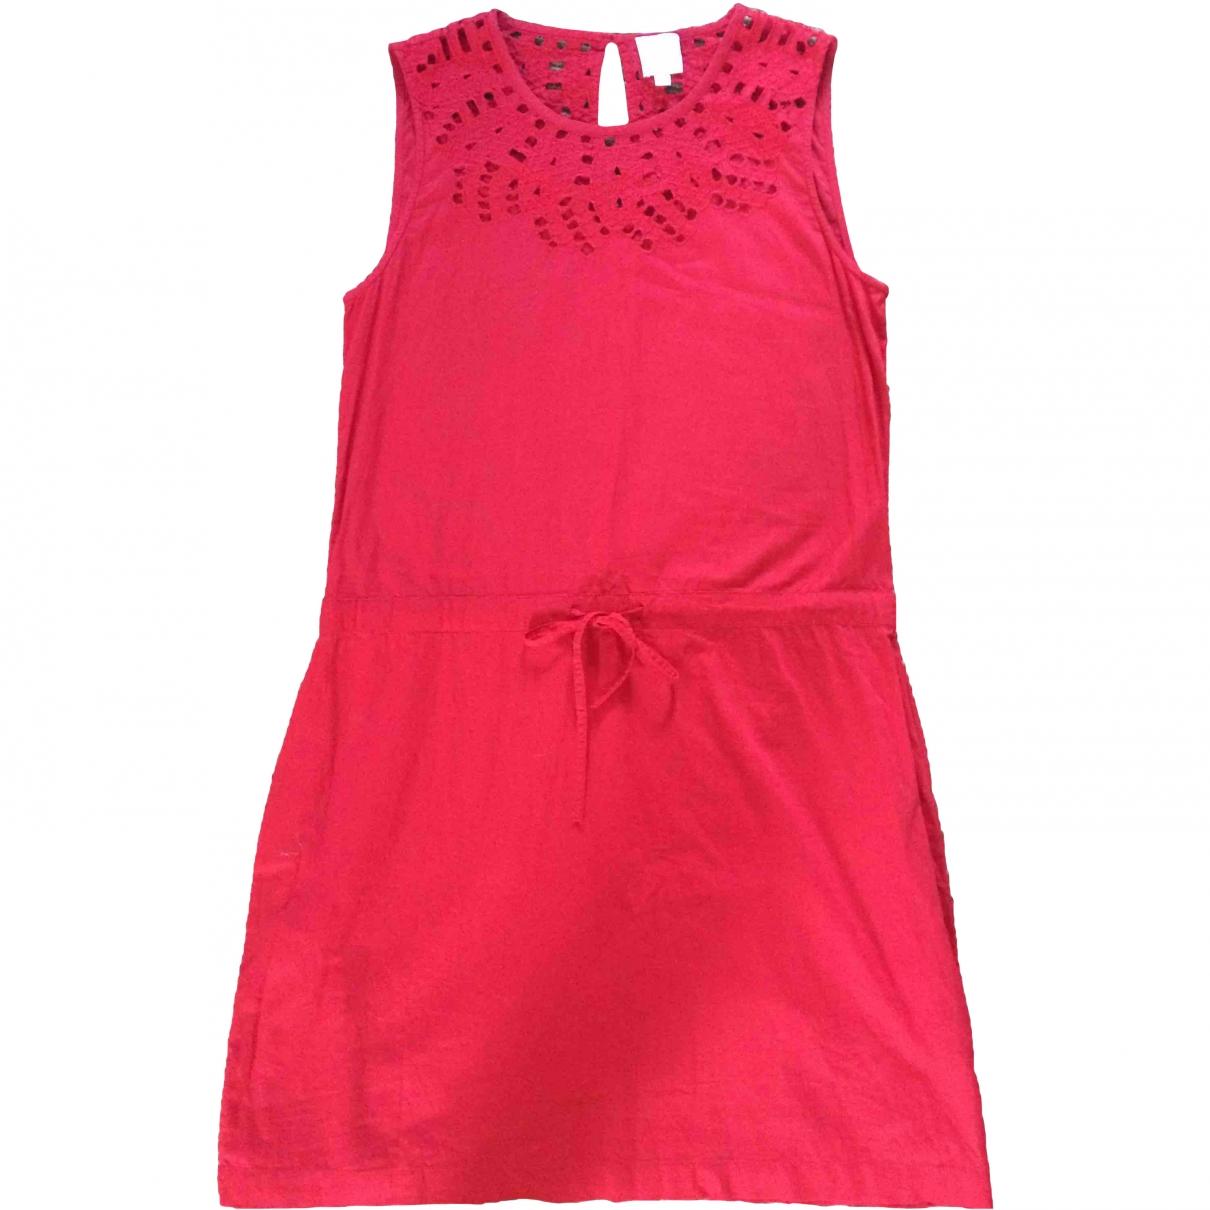 Petite Mendigote \N Red Cotton dress for Women S International